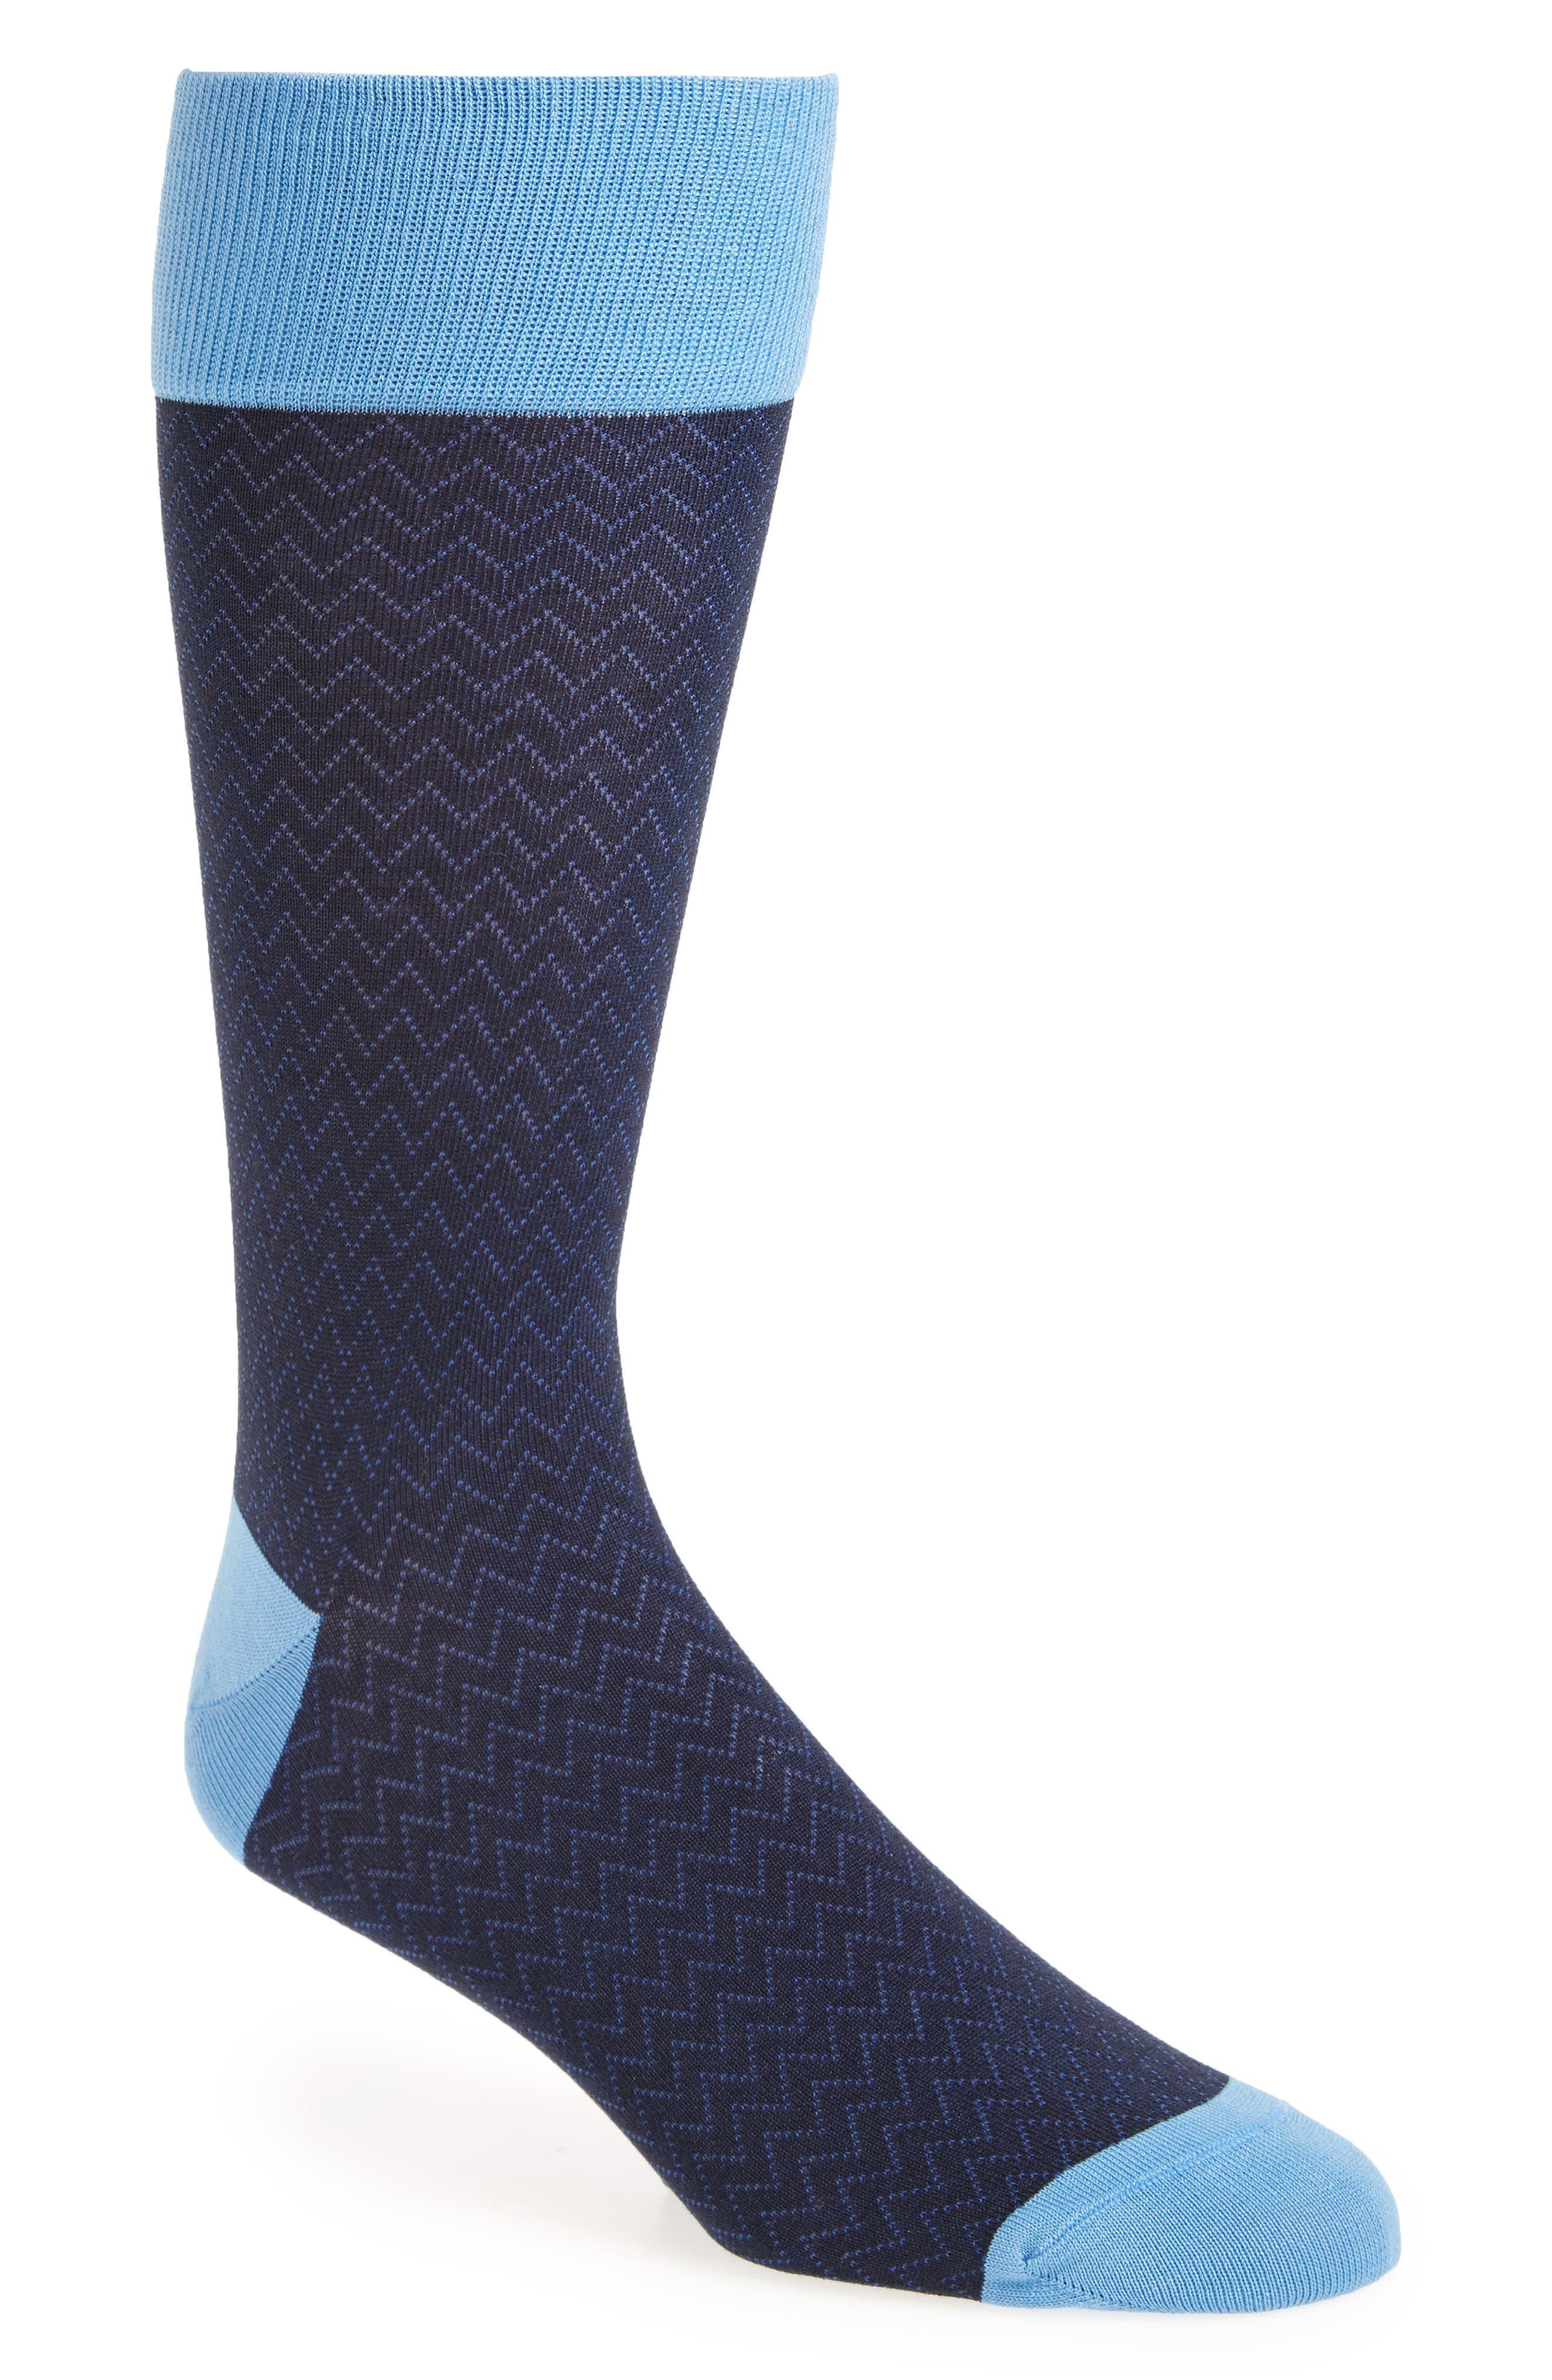 Mercerized Herringbone Socks,                         Main,                         color, Navy/ Blue